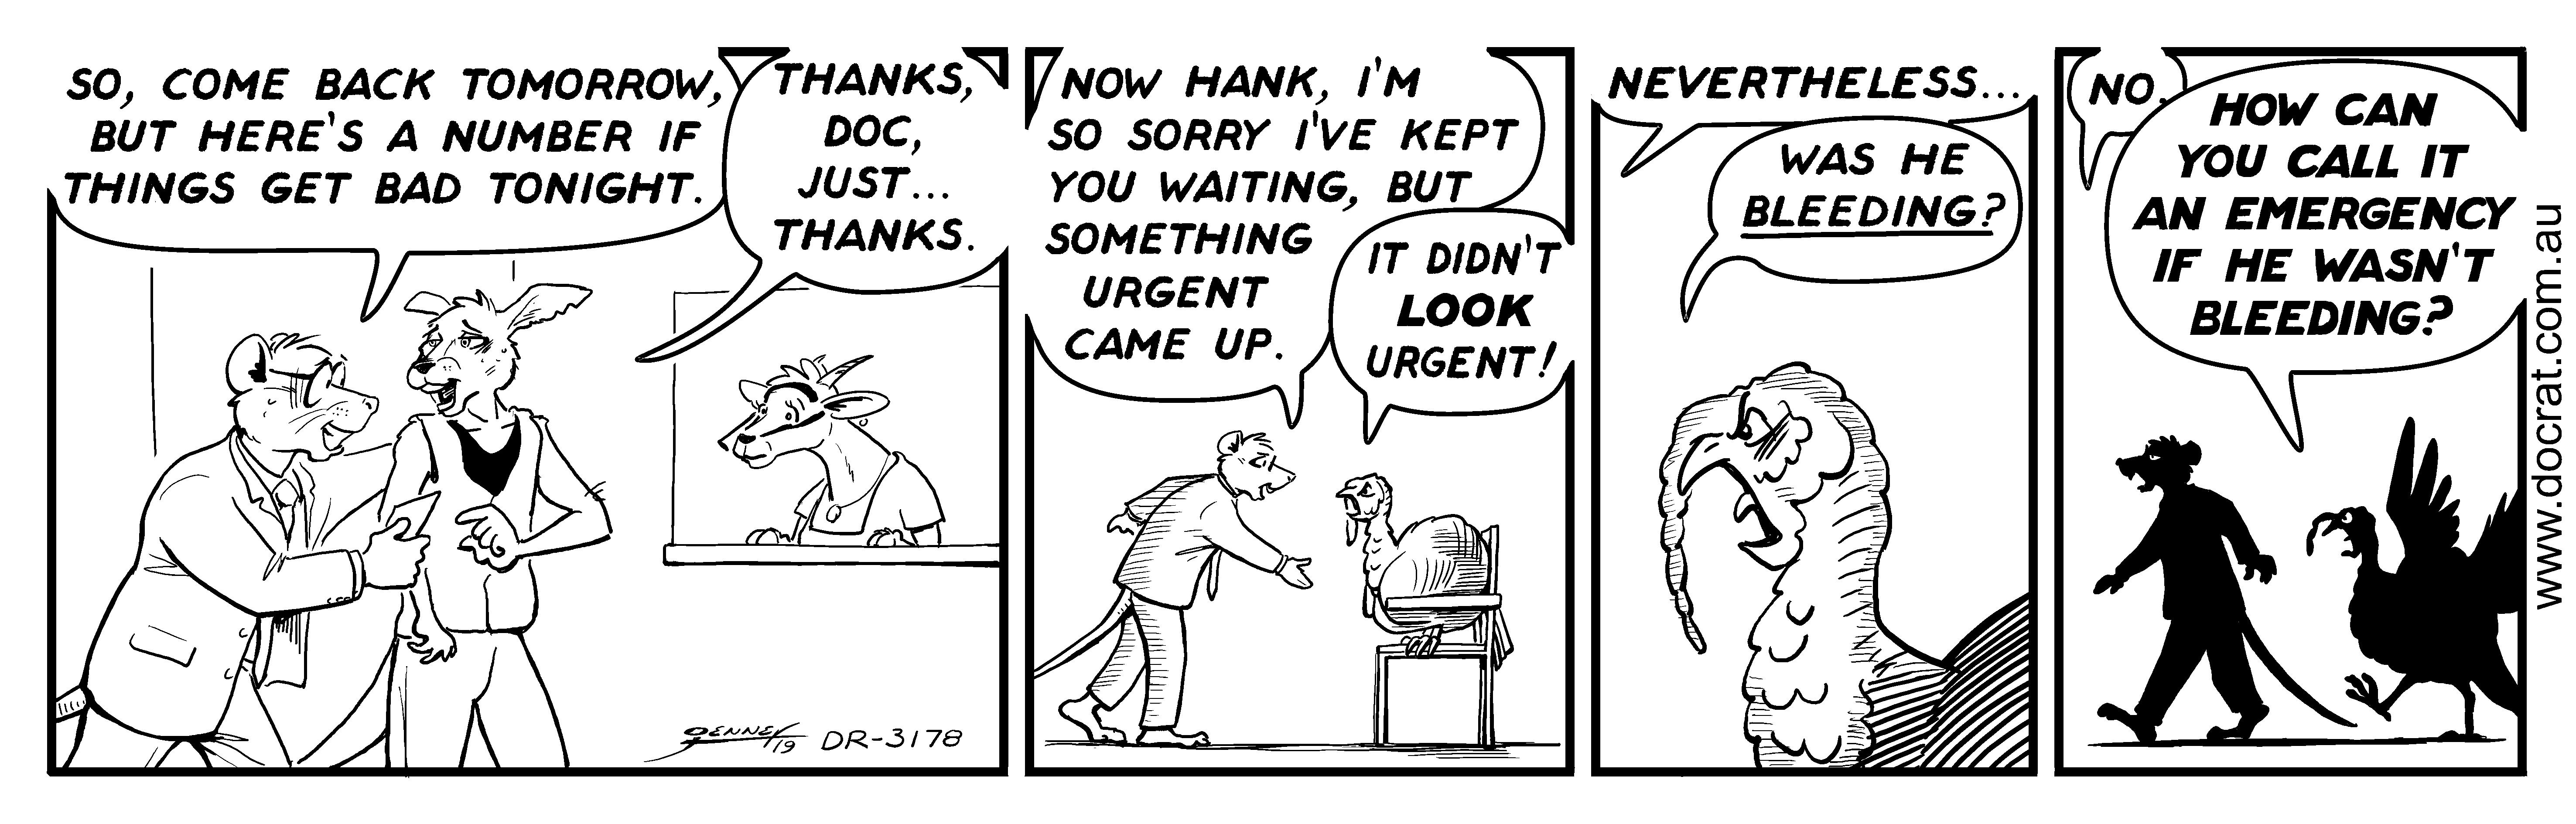 20190206